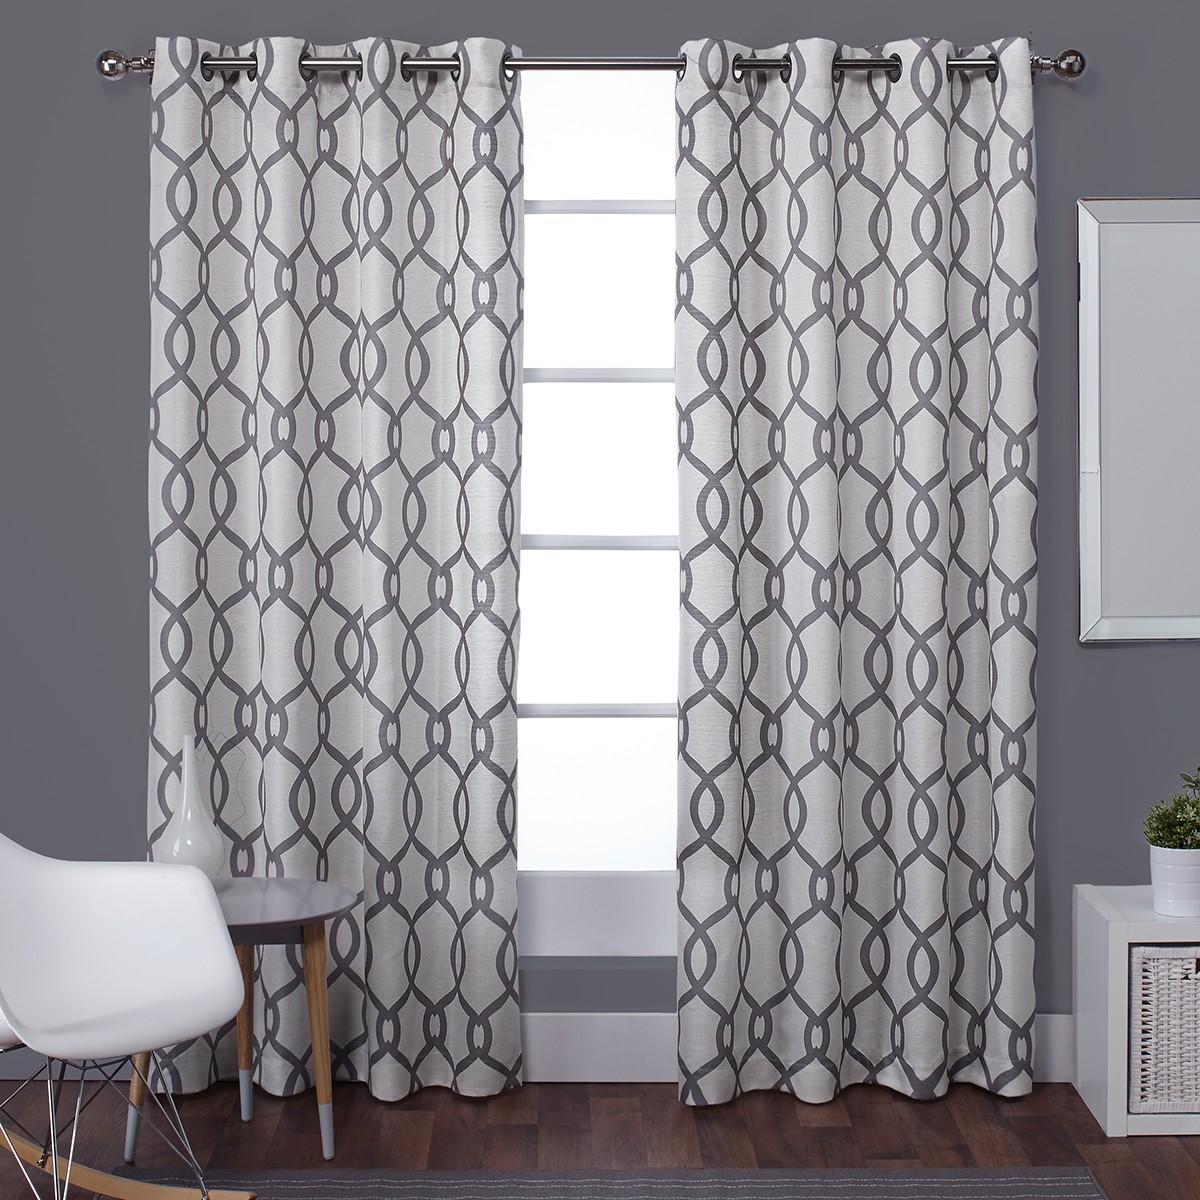 chain link curtains